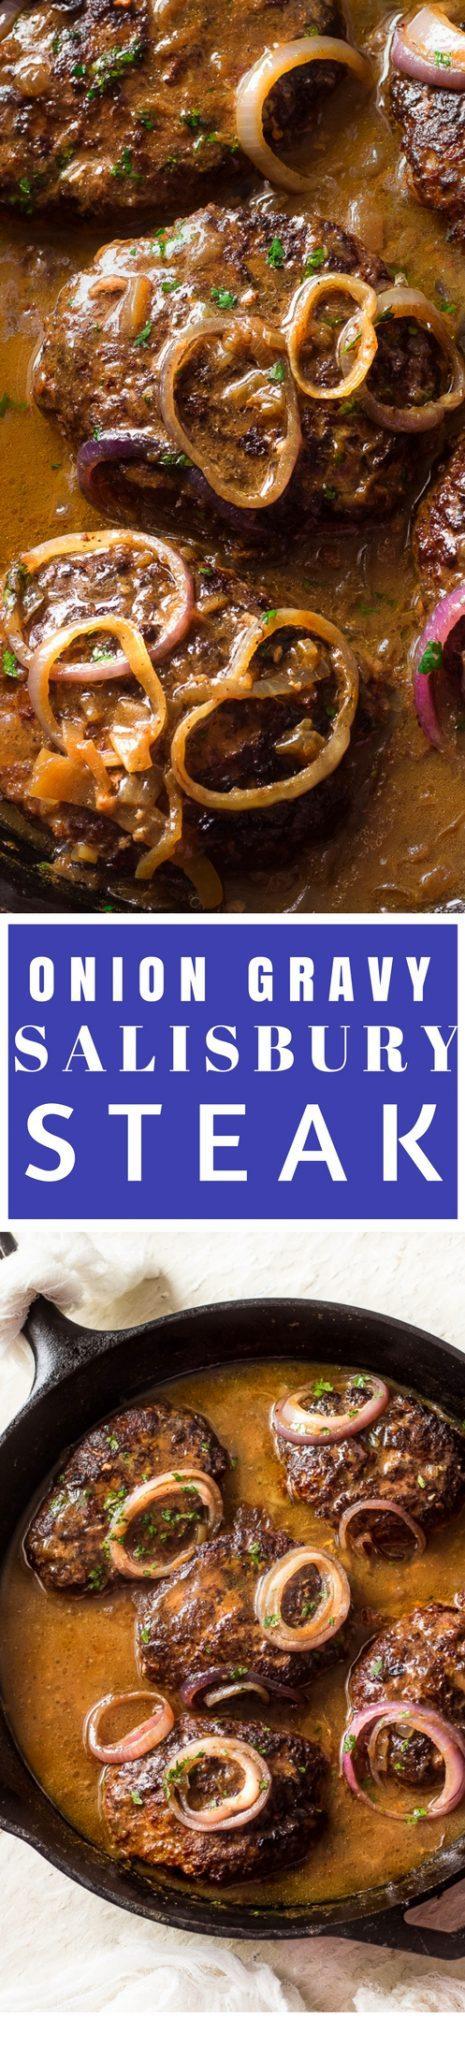 Salisbury Steak Recipe With Onion Gravy